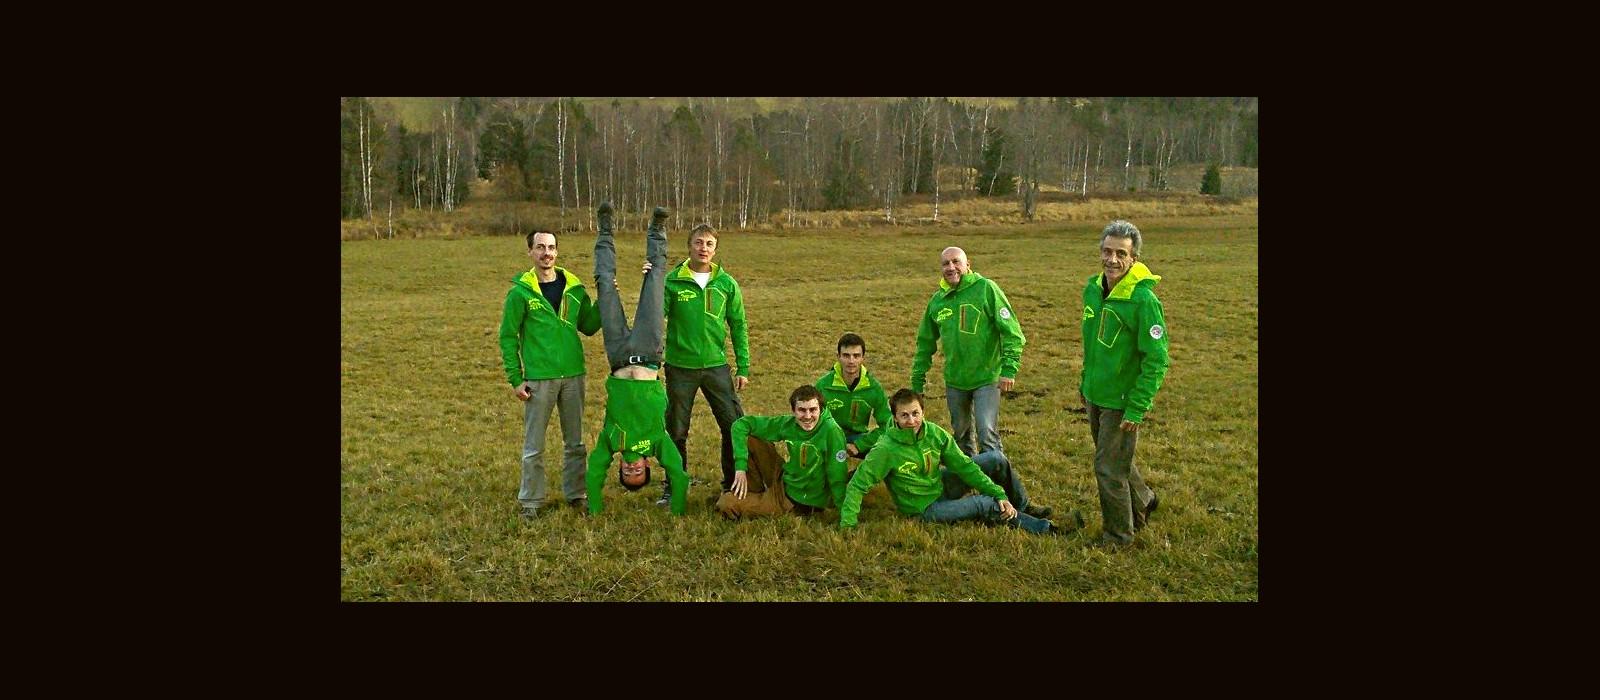 l'équipe de Natur'Odyssée Jura